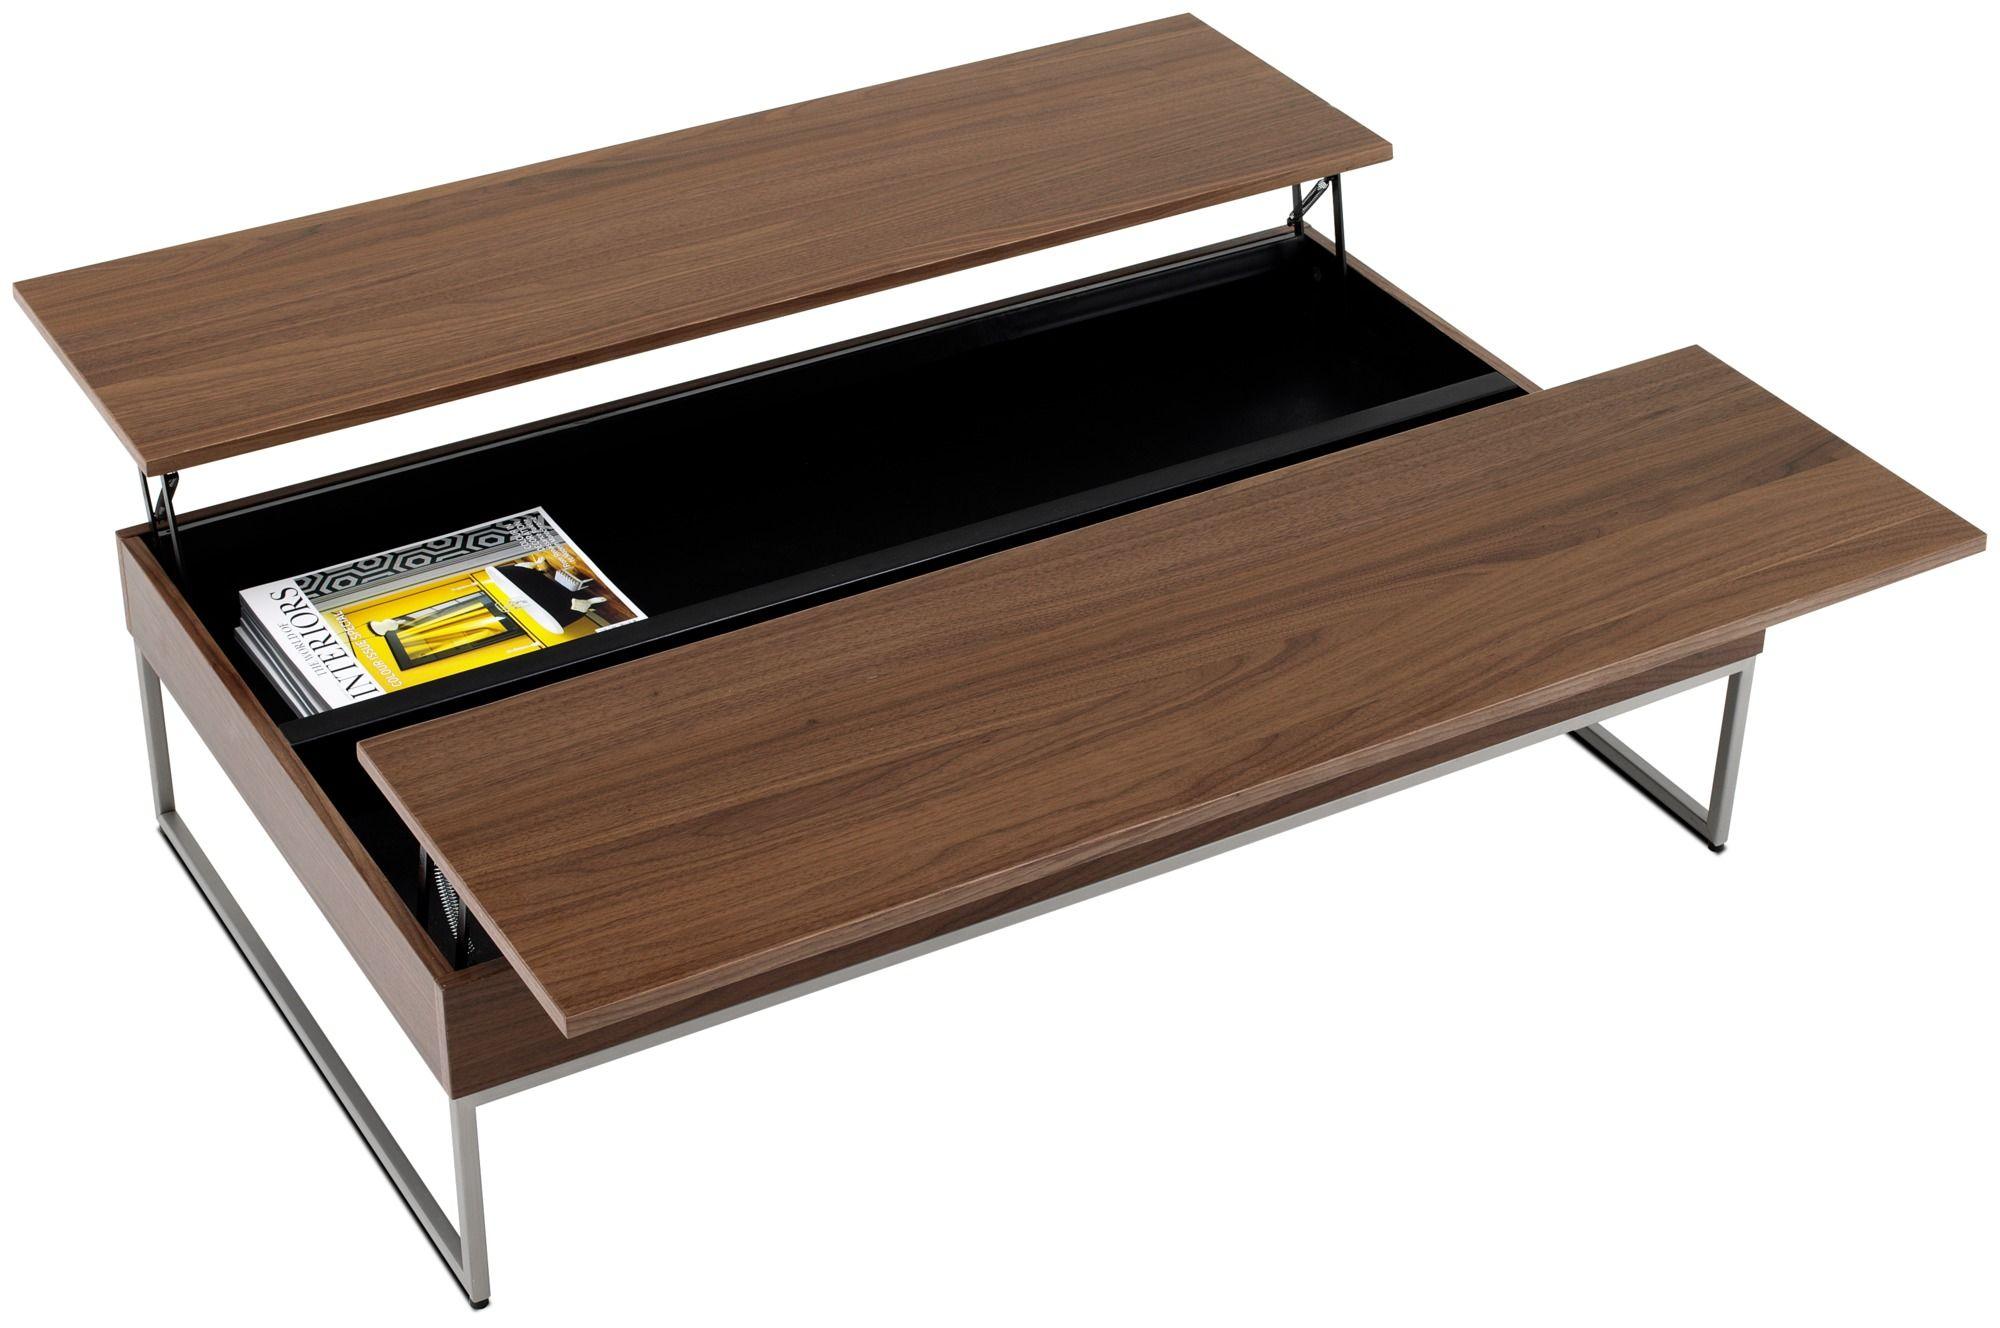 Boconcept tables basses mobilier furniture mobilier de salon table basse et table basse - Bo concept table basse ...